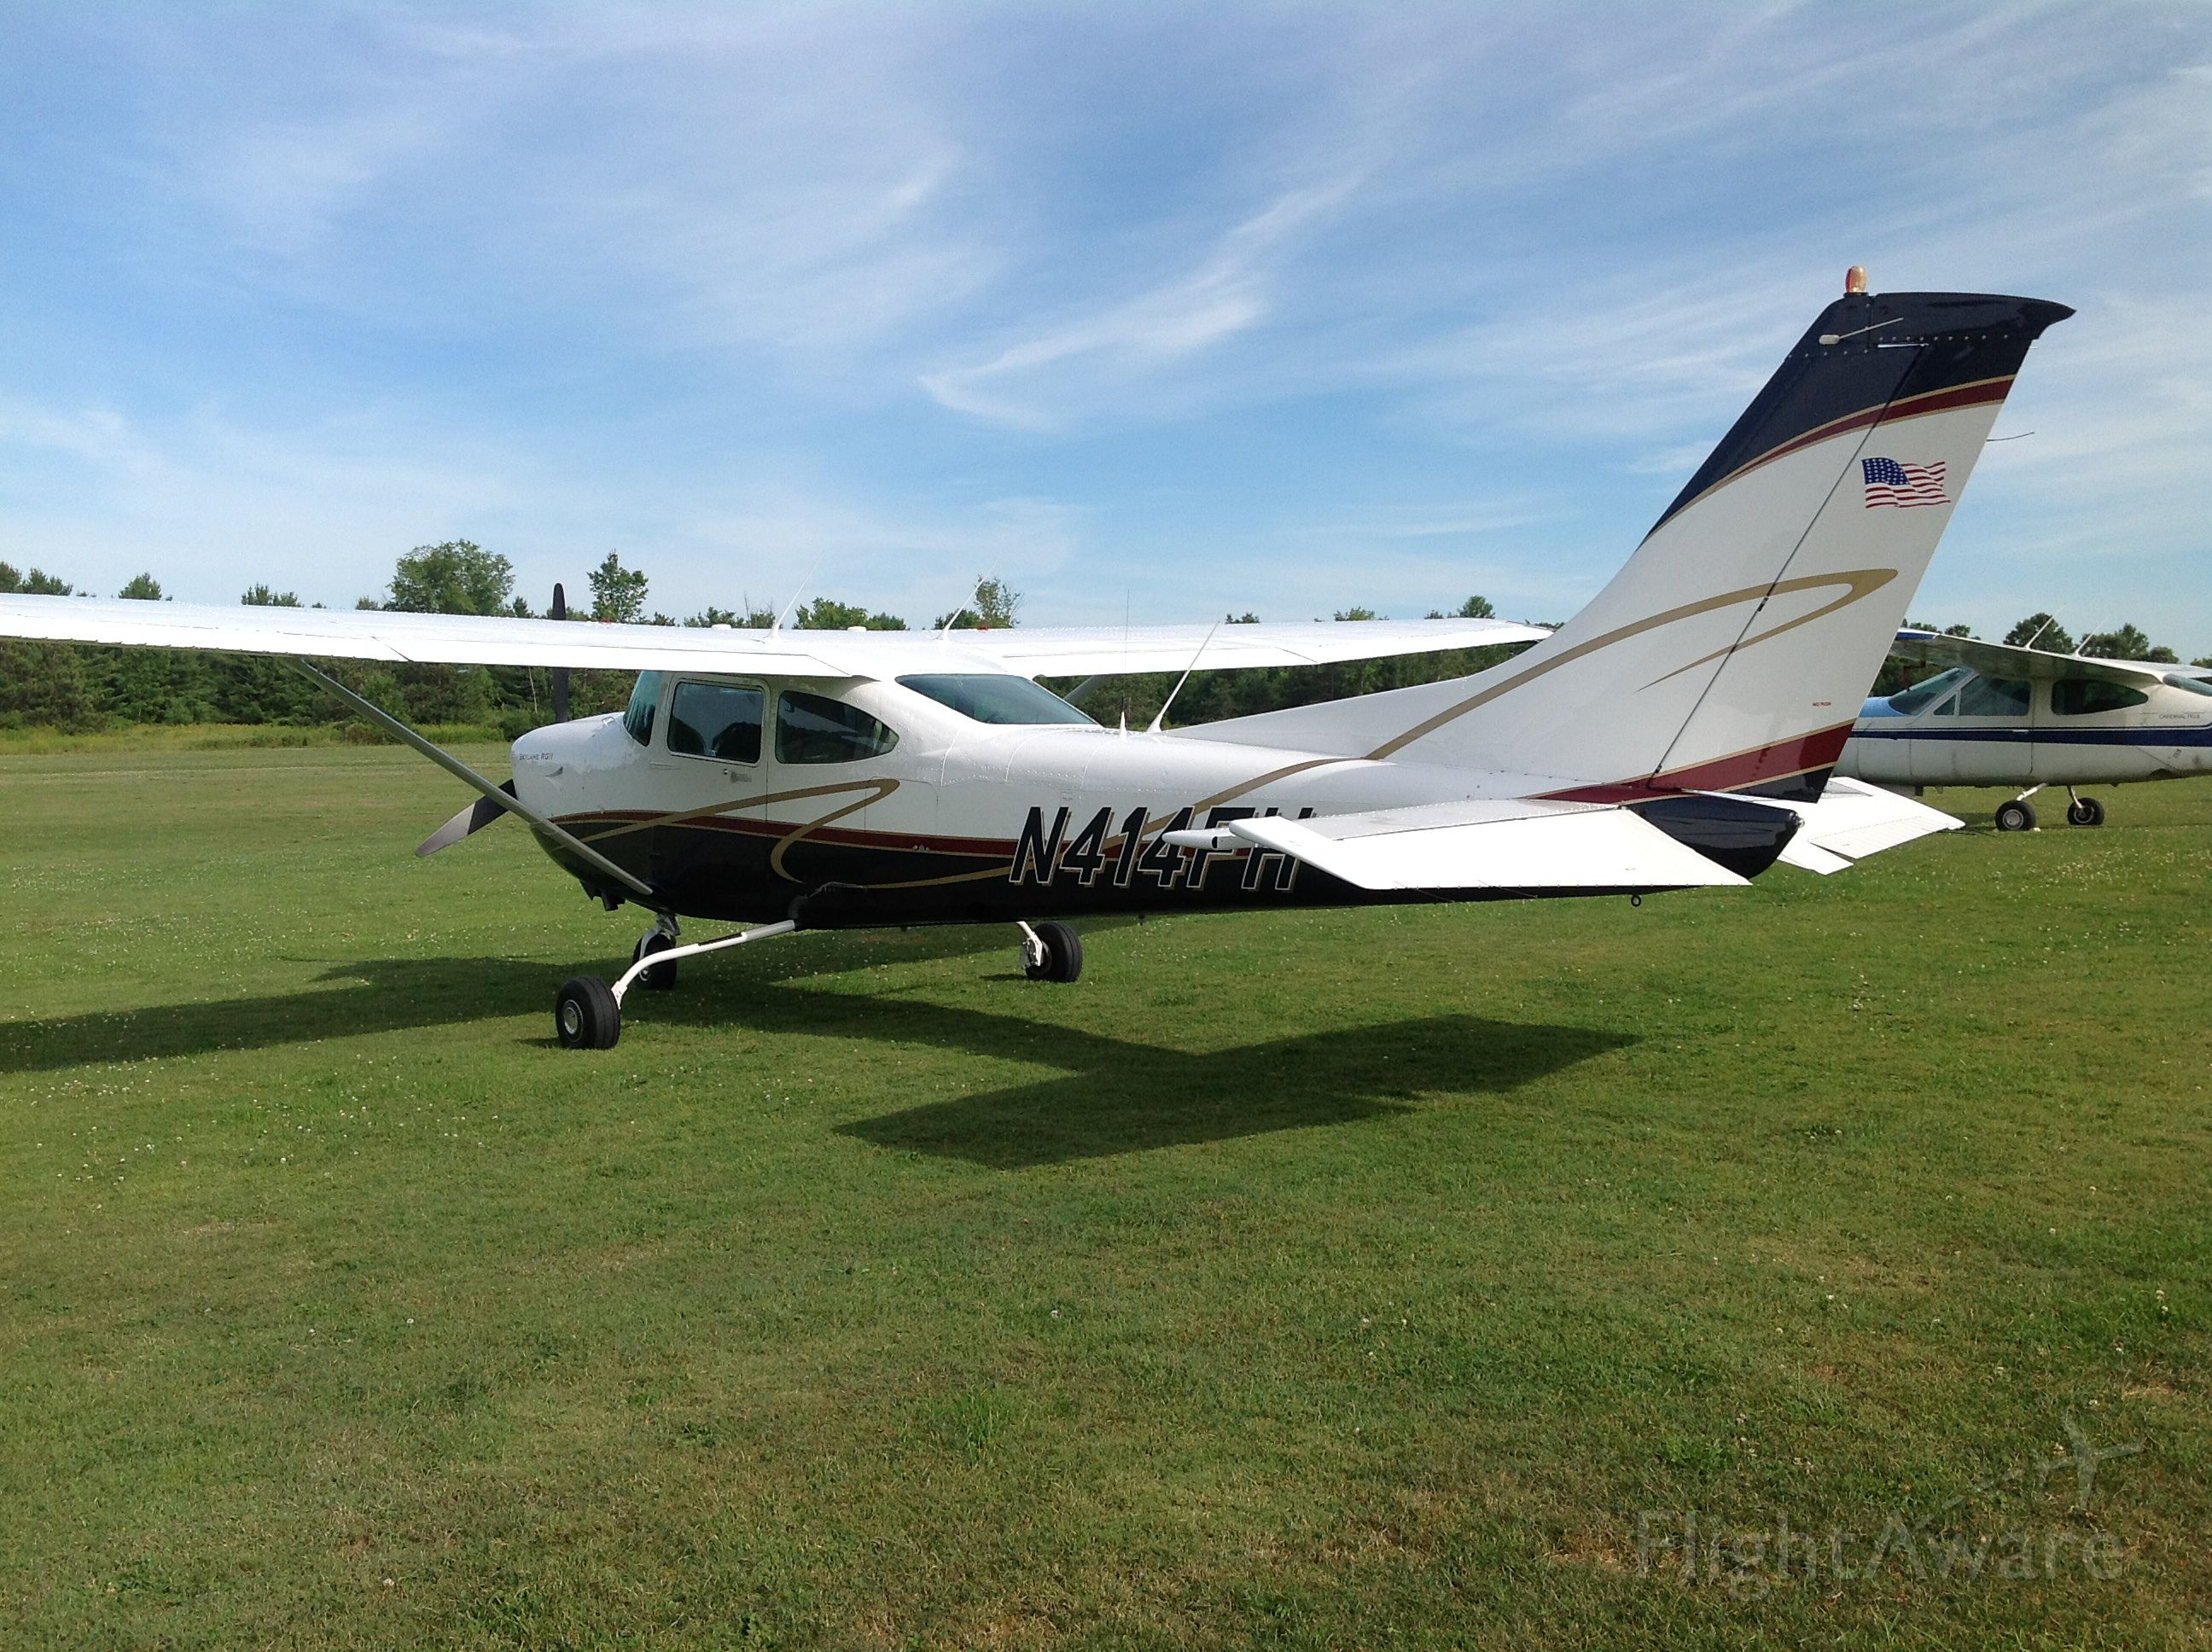 Cessna Skylane RG (N414FH) - Beautiful summer afternoon at Basin Harbor, Vermont